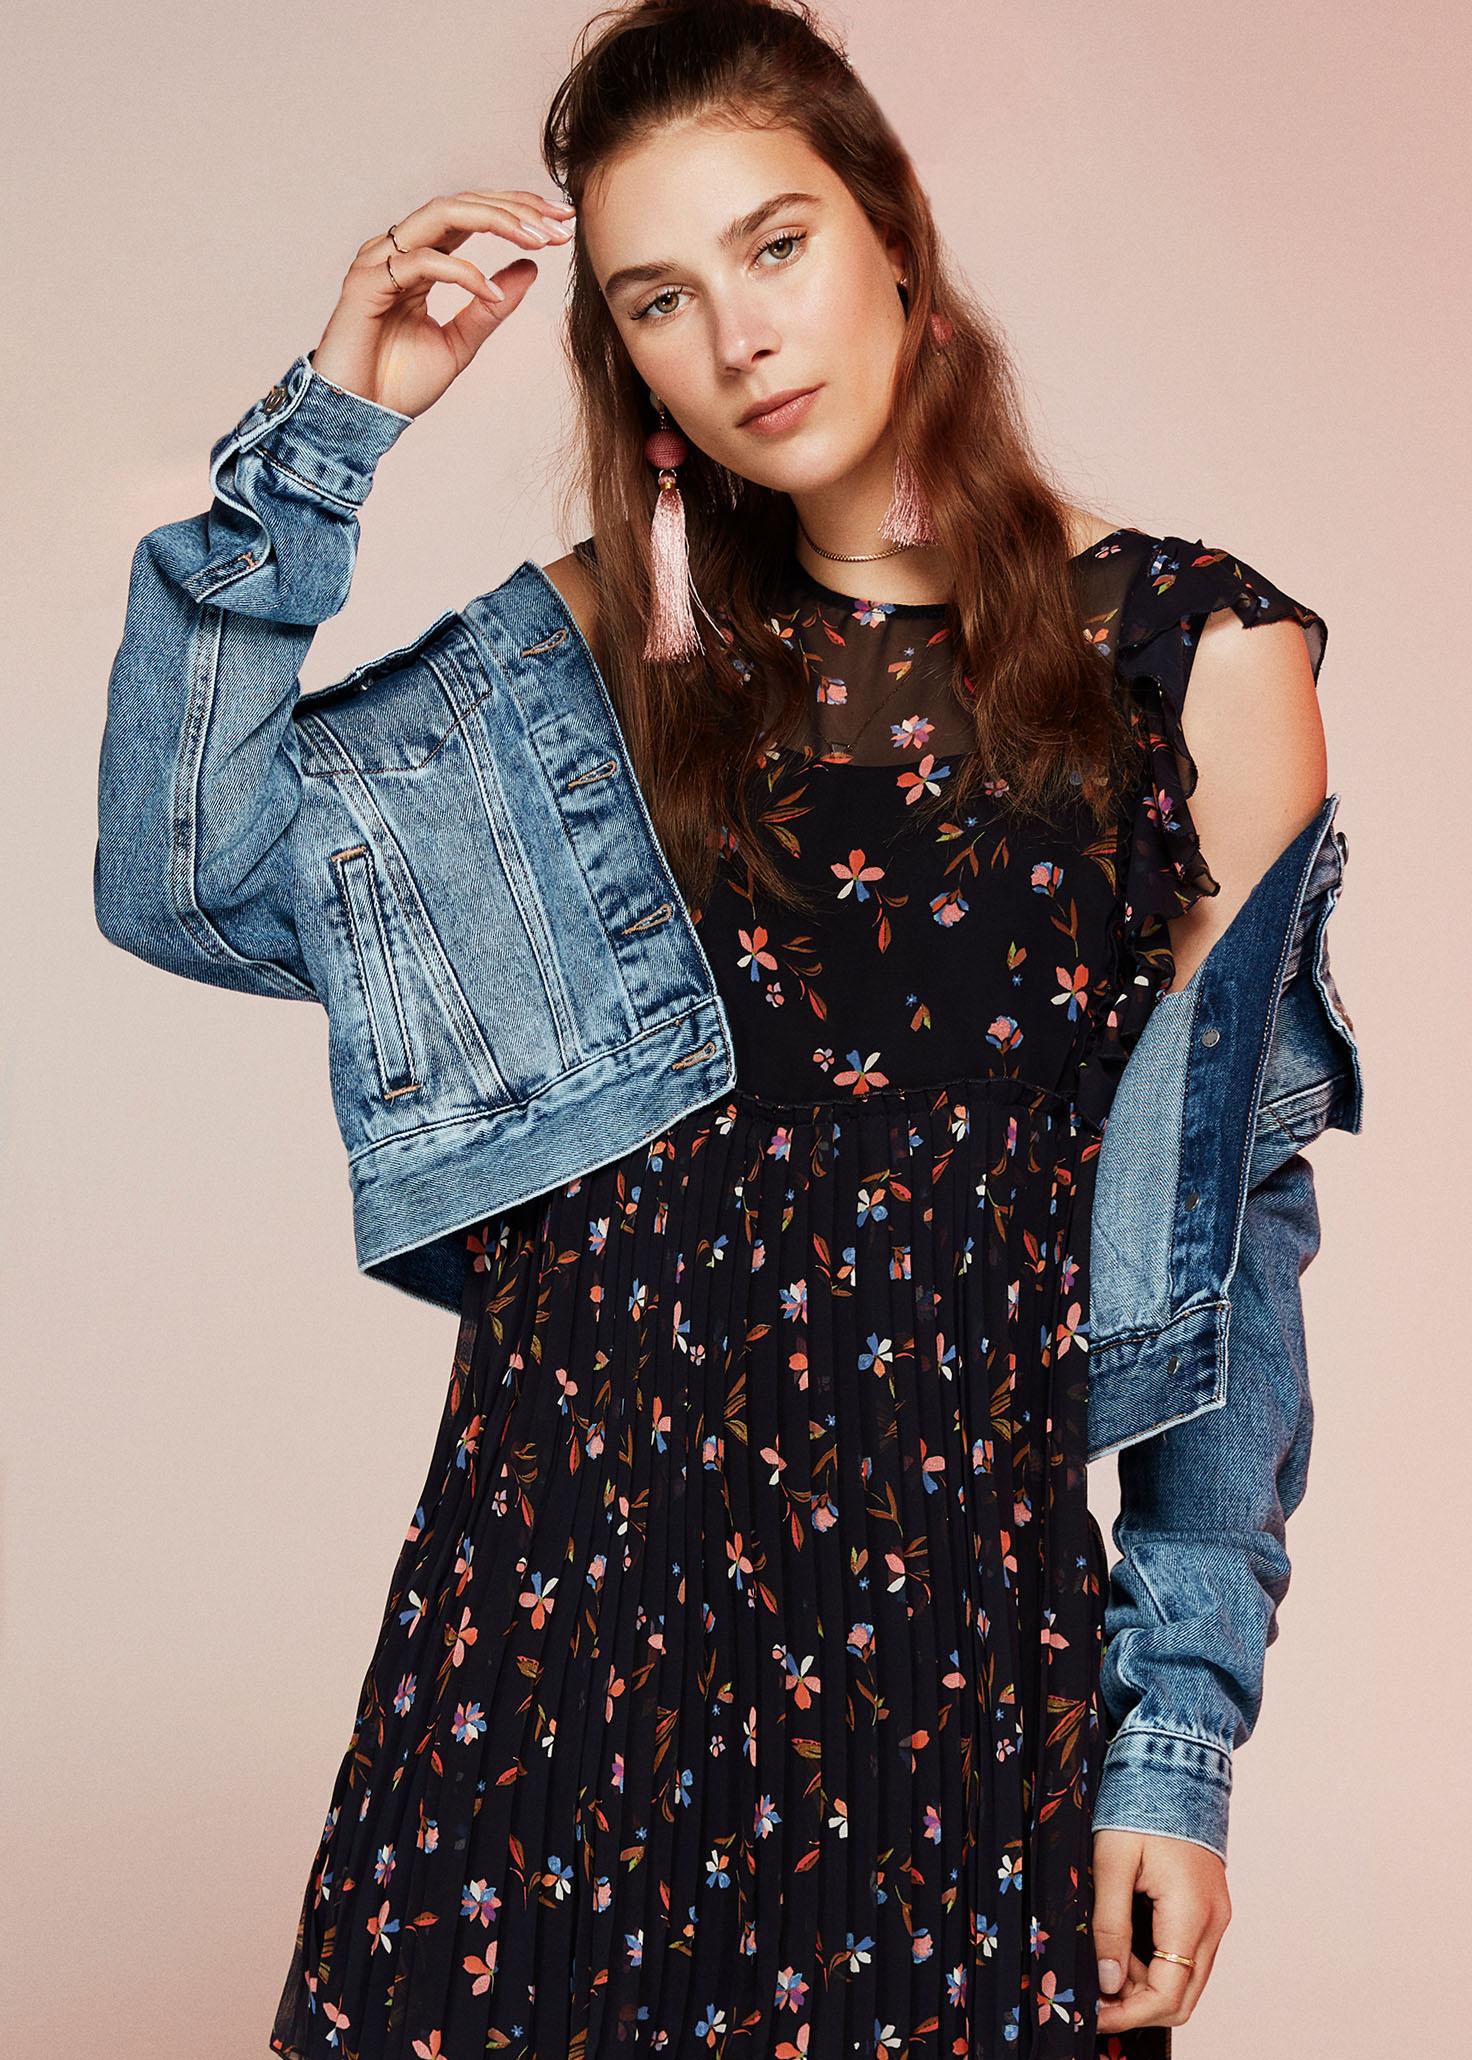 Verspielte Jeansjacken in angesagten Farben in der Mavi Jeans Women Kollektion